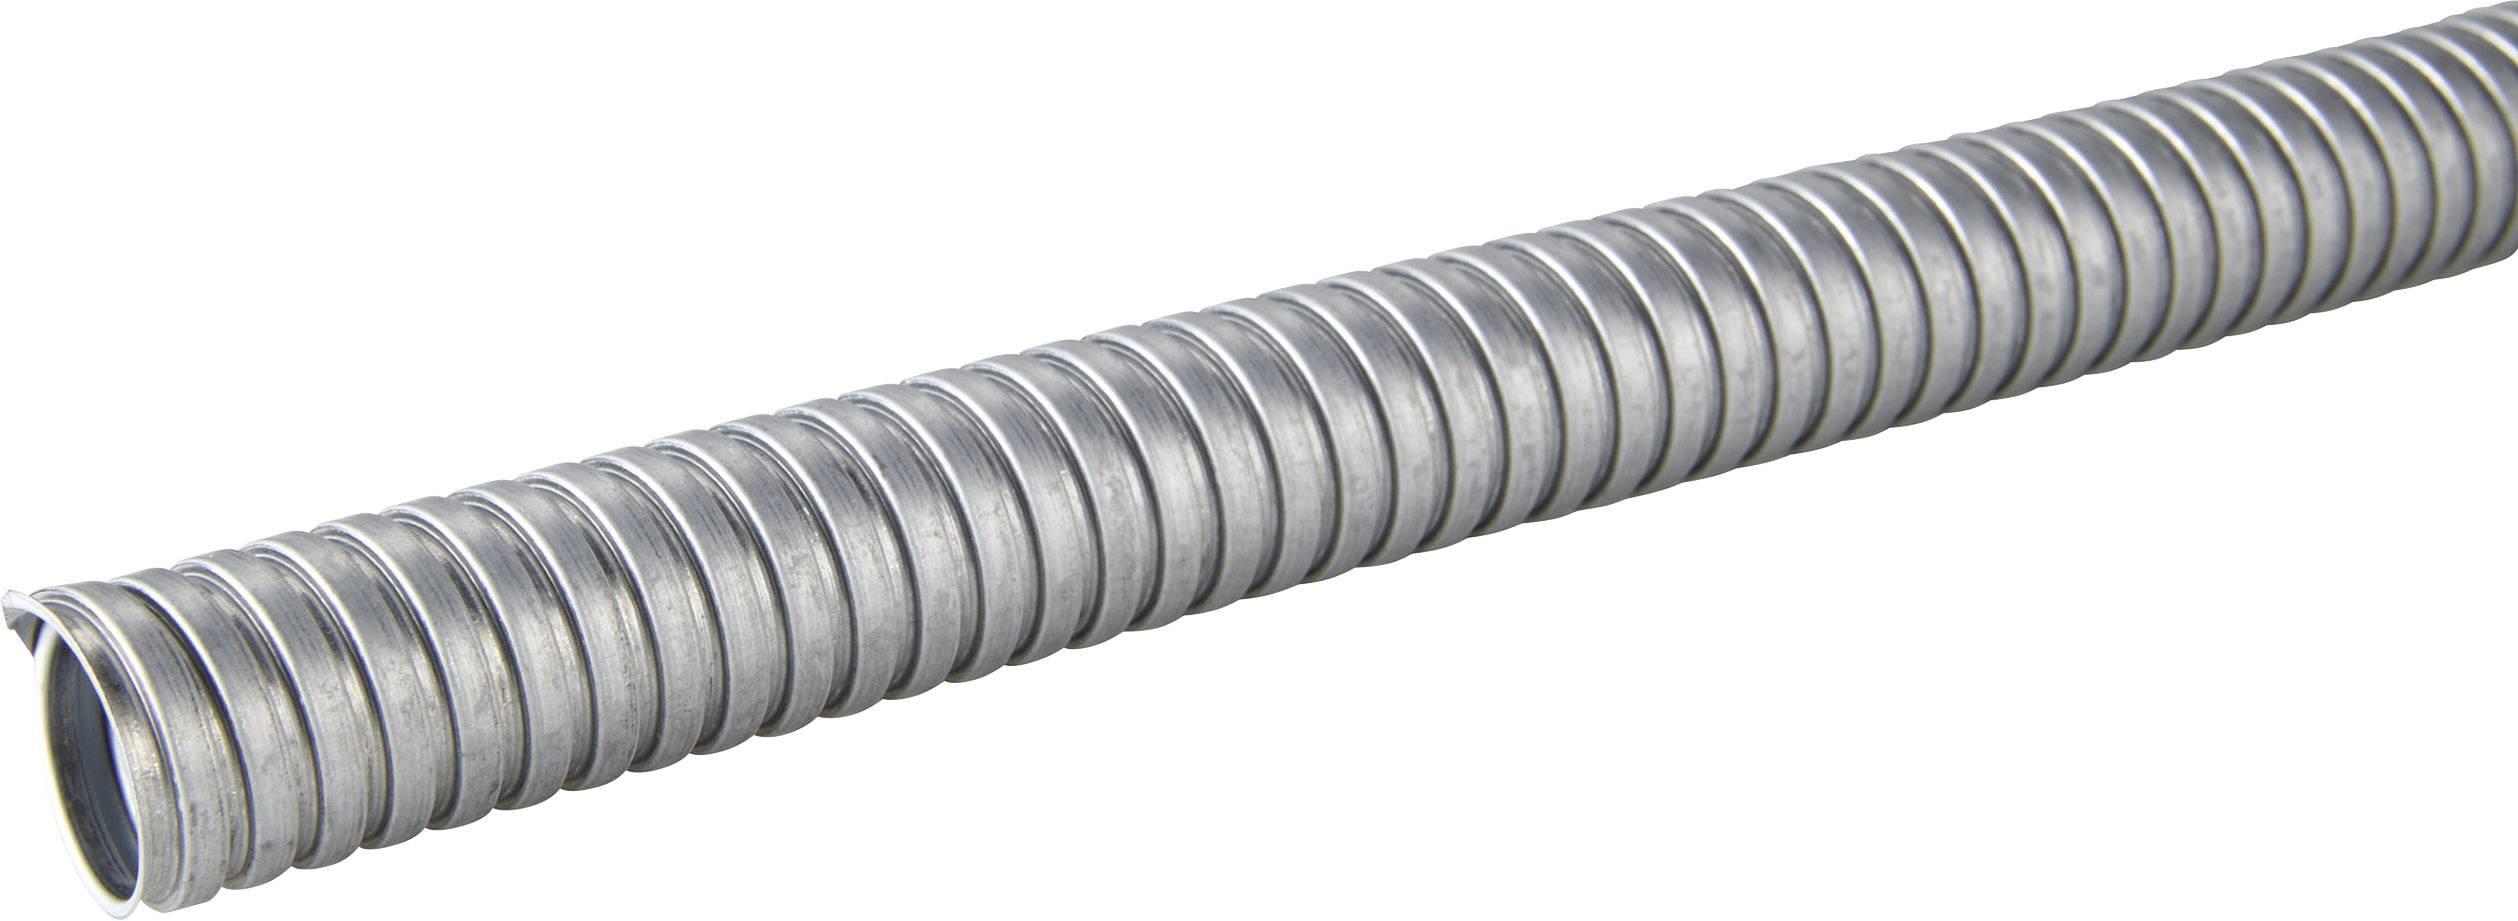 Ochranná hadice na kov LappKabel SILVYN® AS 11/14x17 61802100, stříbrná, 50 m